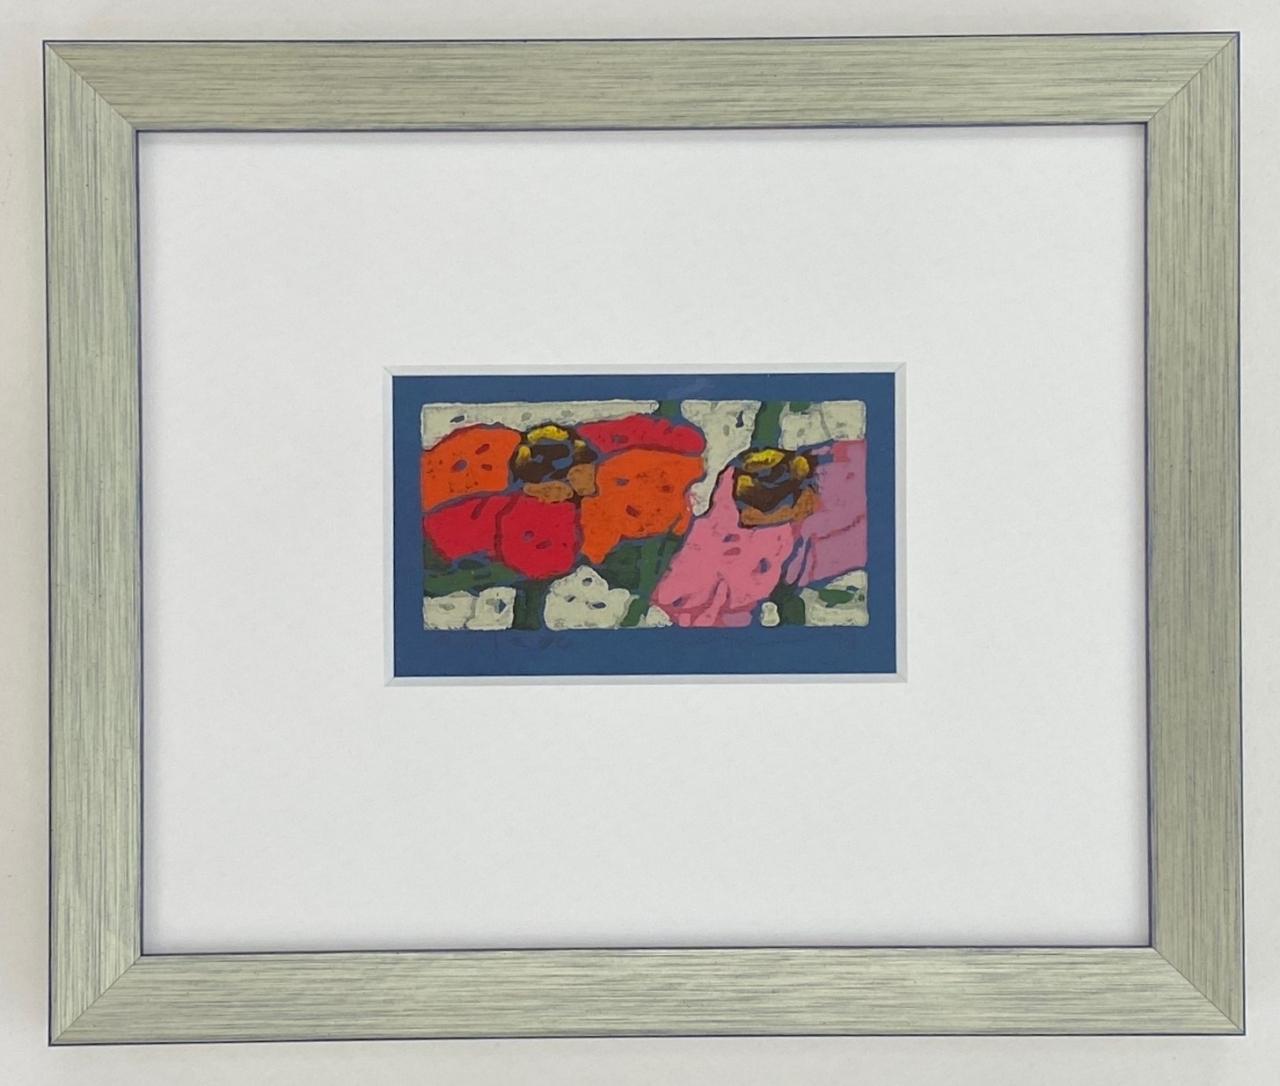 Rosen rot-lila, 2021 auf blauem Papier, gerahmt